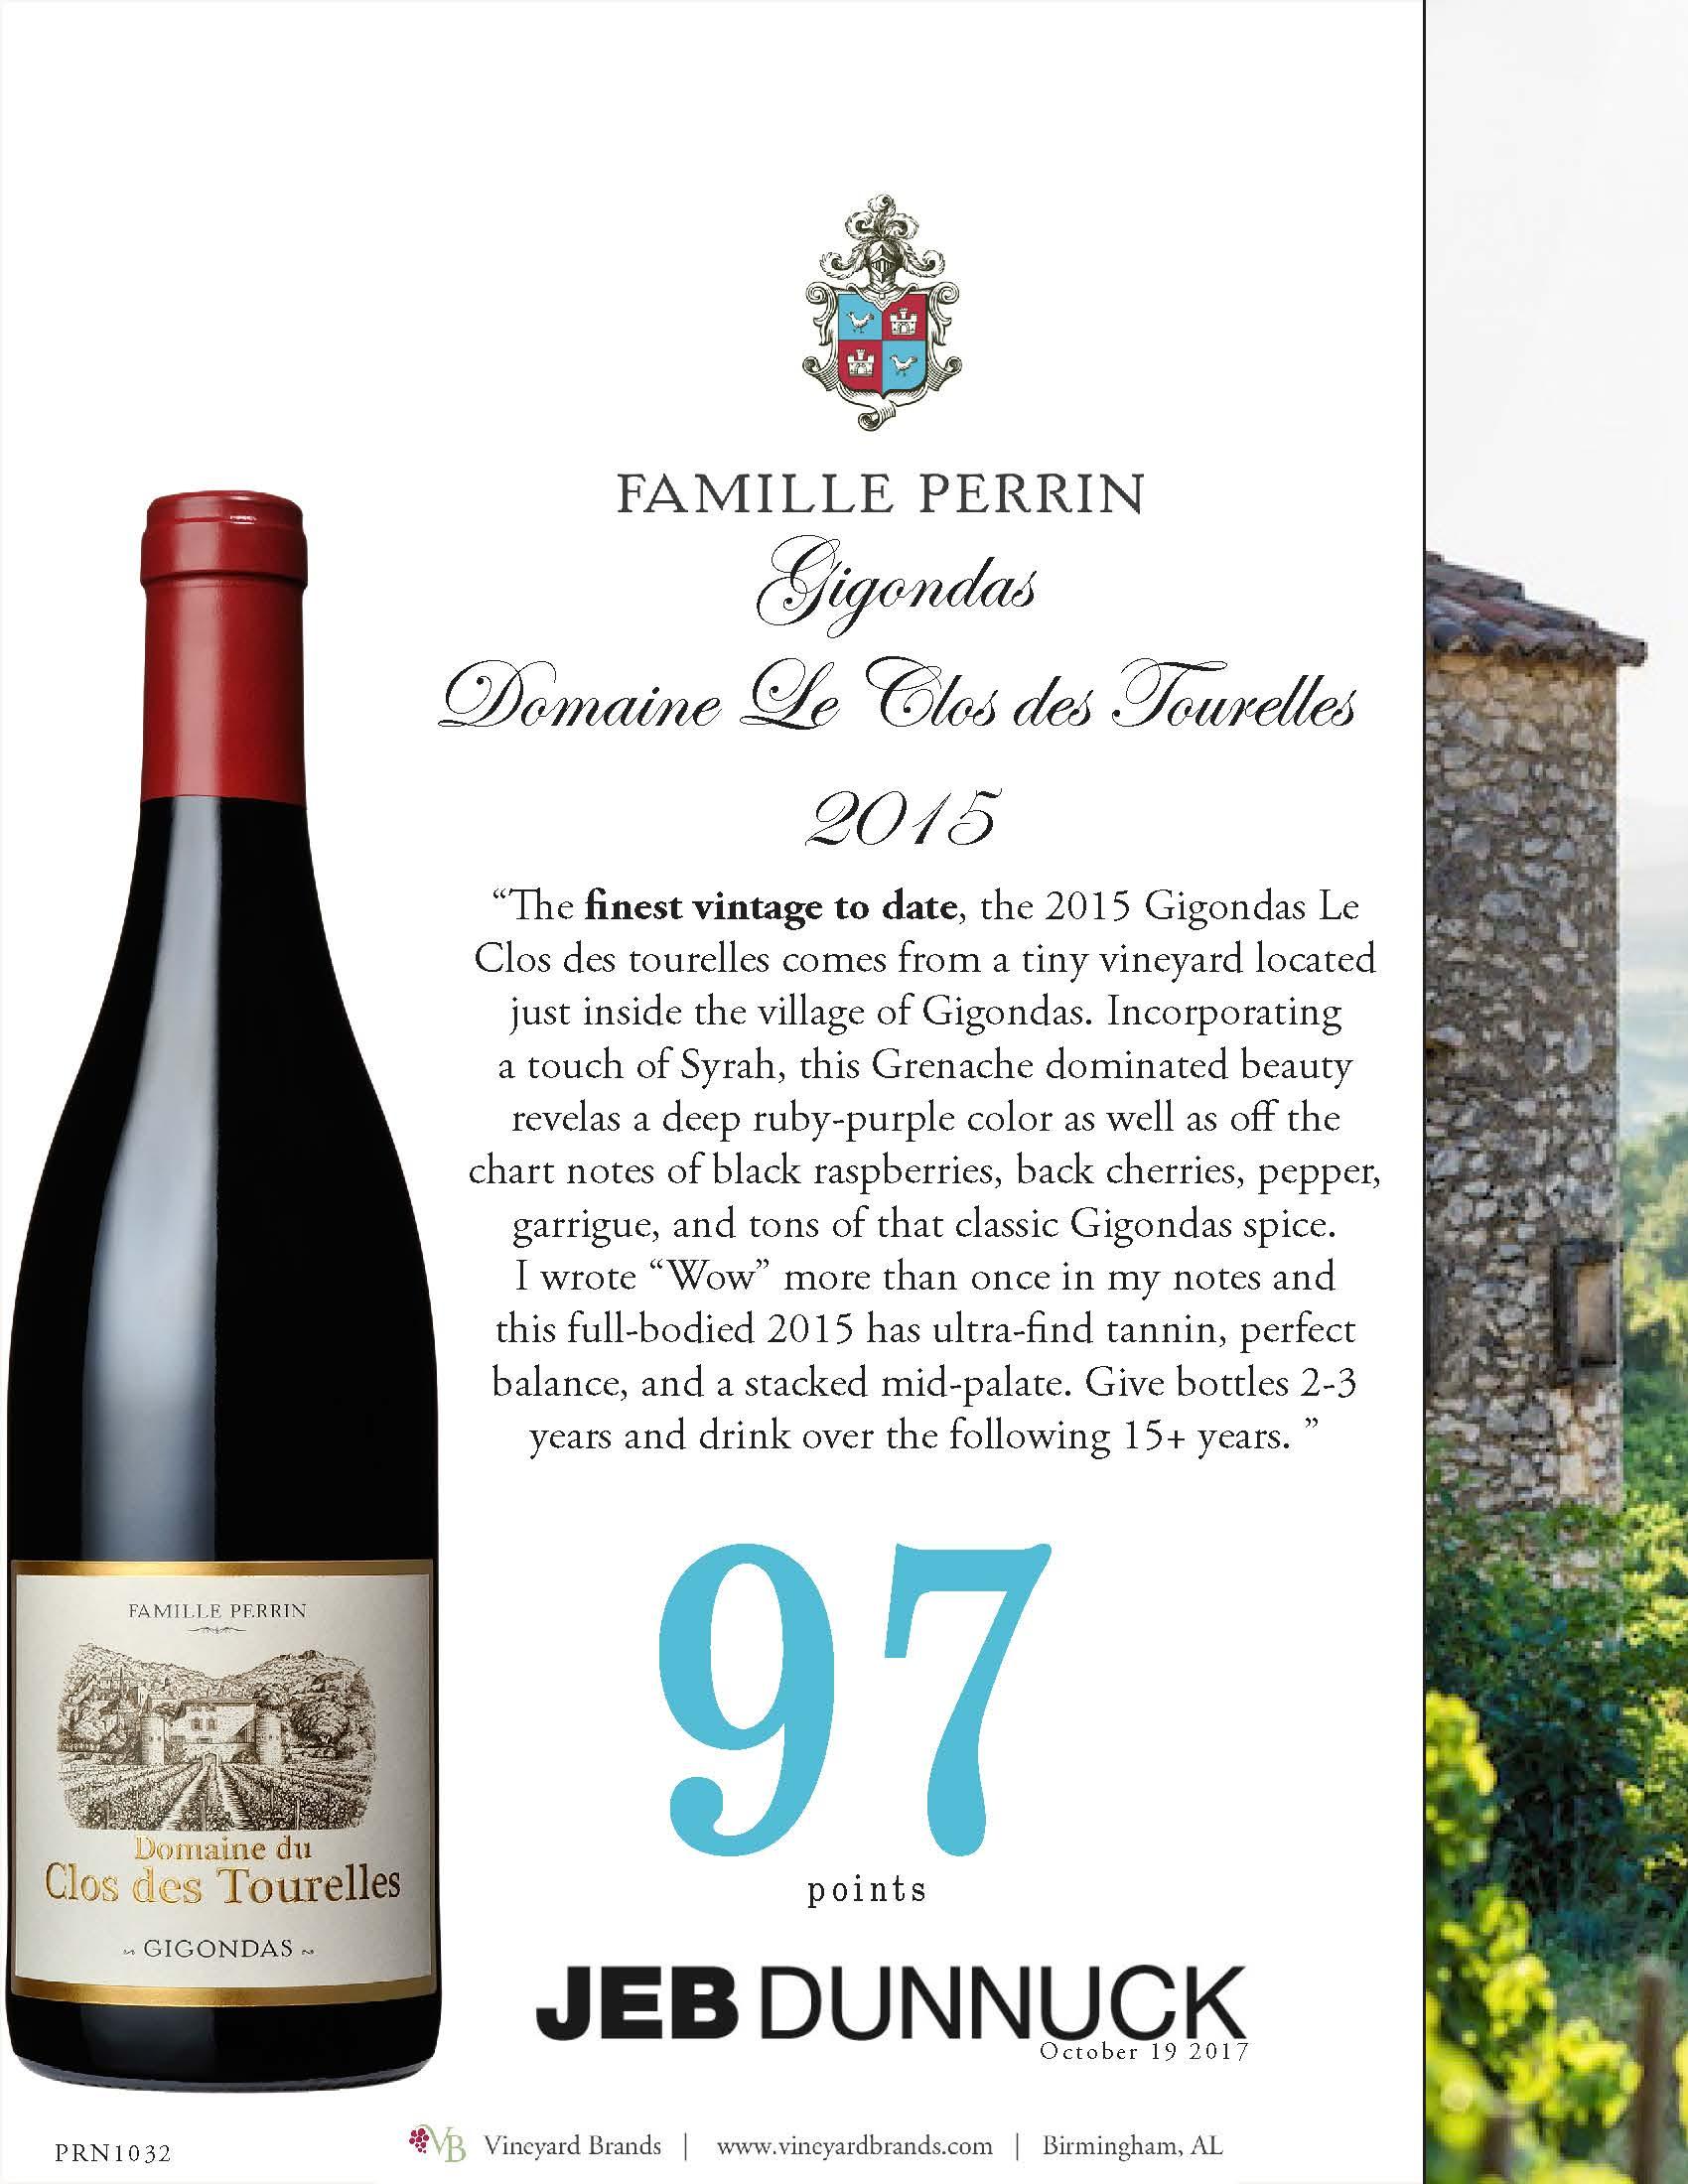 Famille Perrin_Gigondas Le Clos des Tourelles 2015.jpg